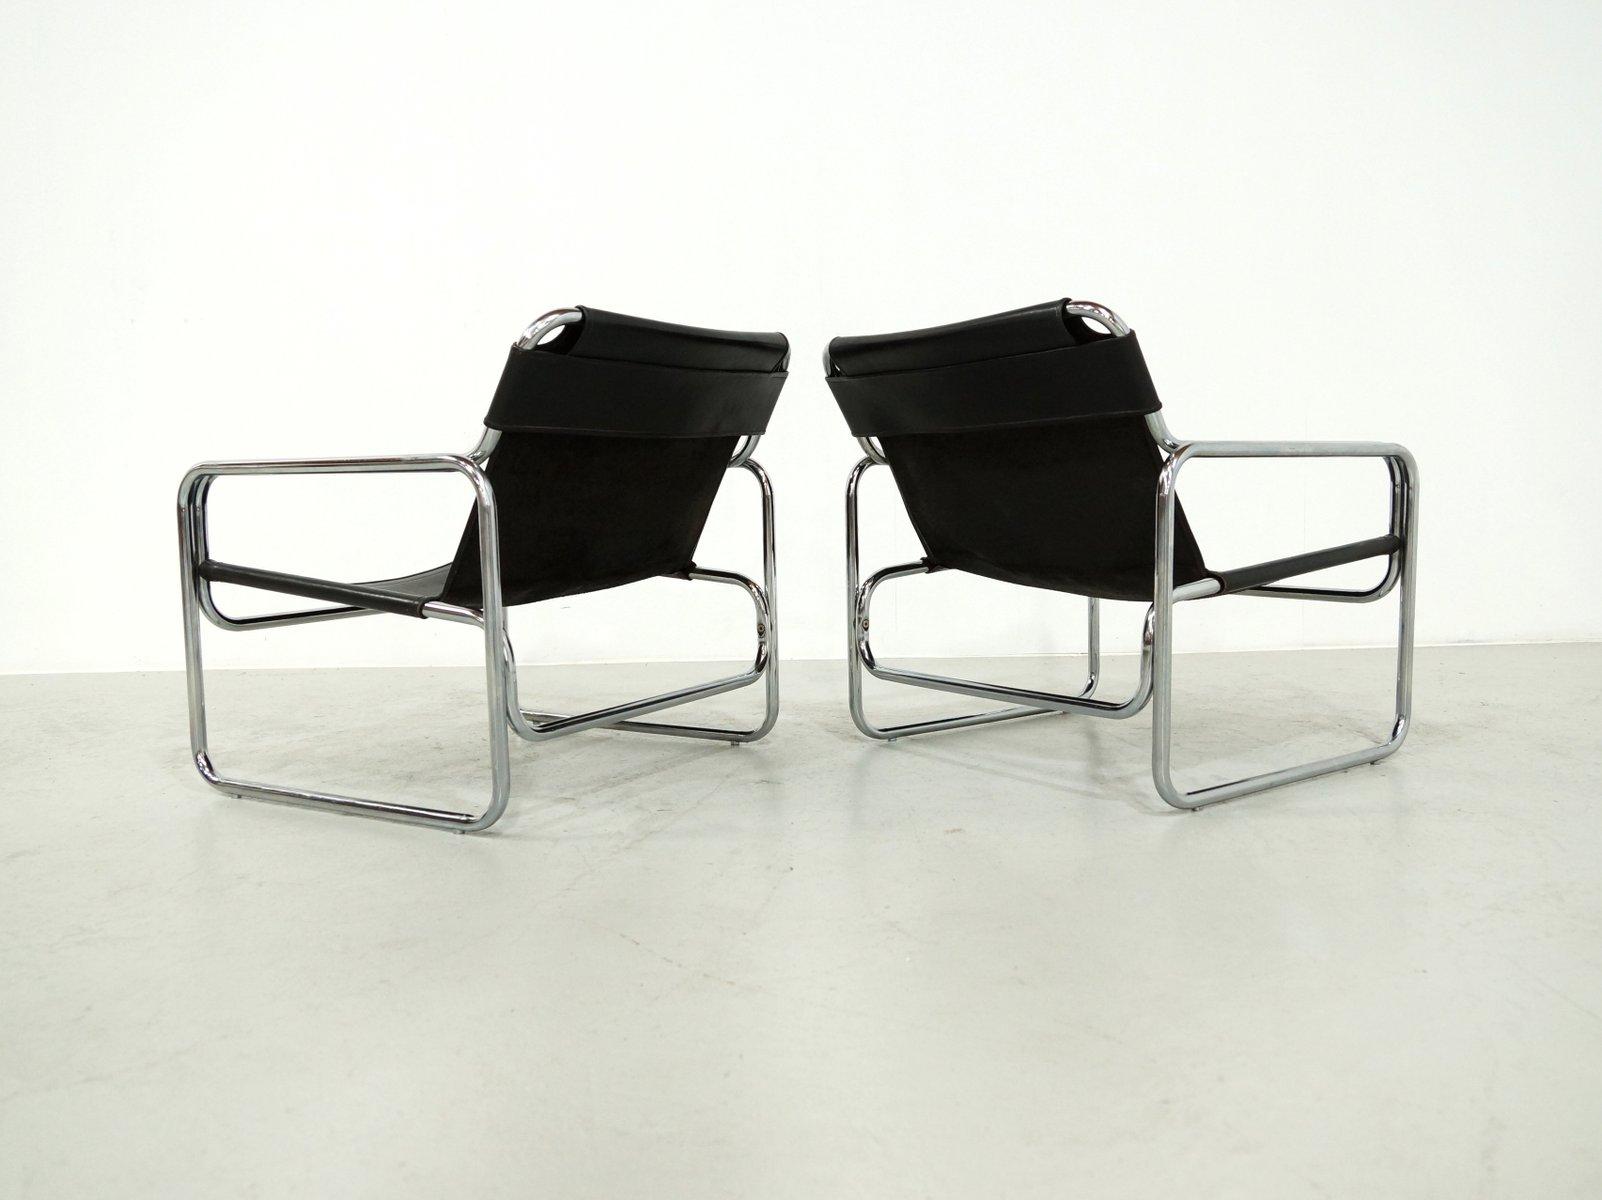 italienische schwarze leder attico st hle von antonello mosca f r elisse 1970er 2er set bei. Black Bedroom Furniture Sets. Home Design Ideas